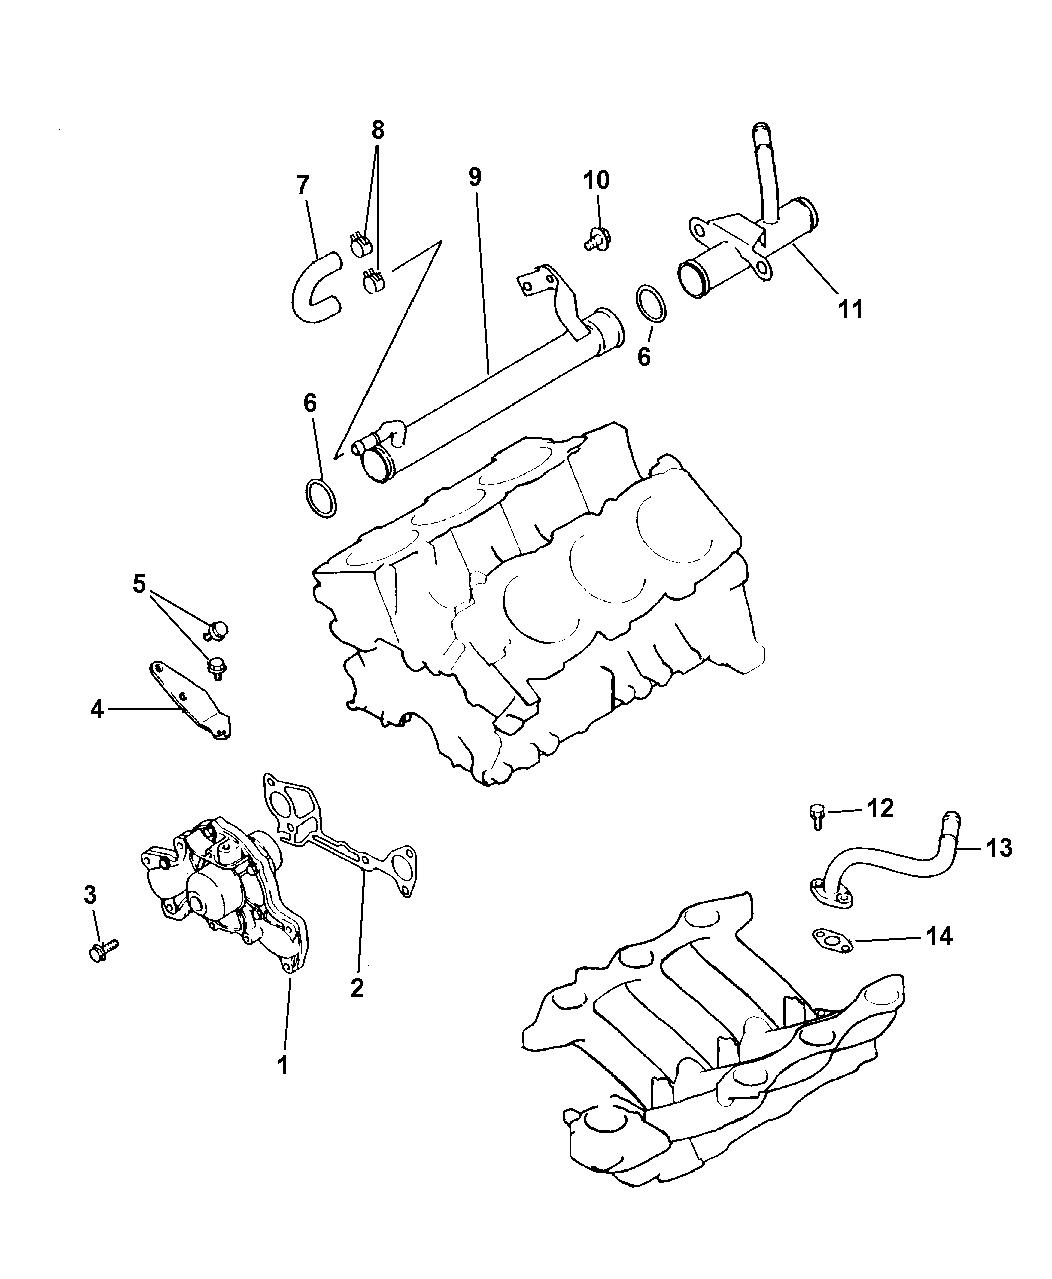 1998 Dodge Grand Caravan Water Pump & Related Parts - Thumbnail 2